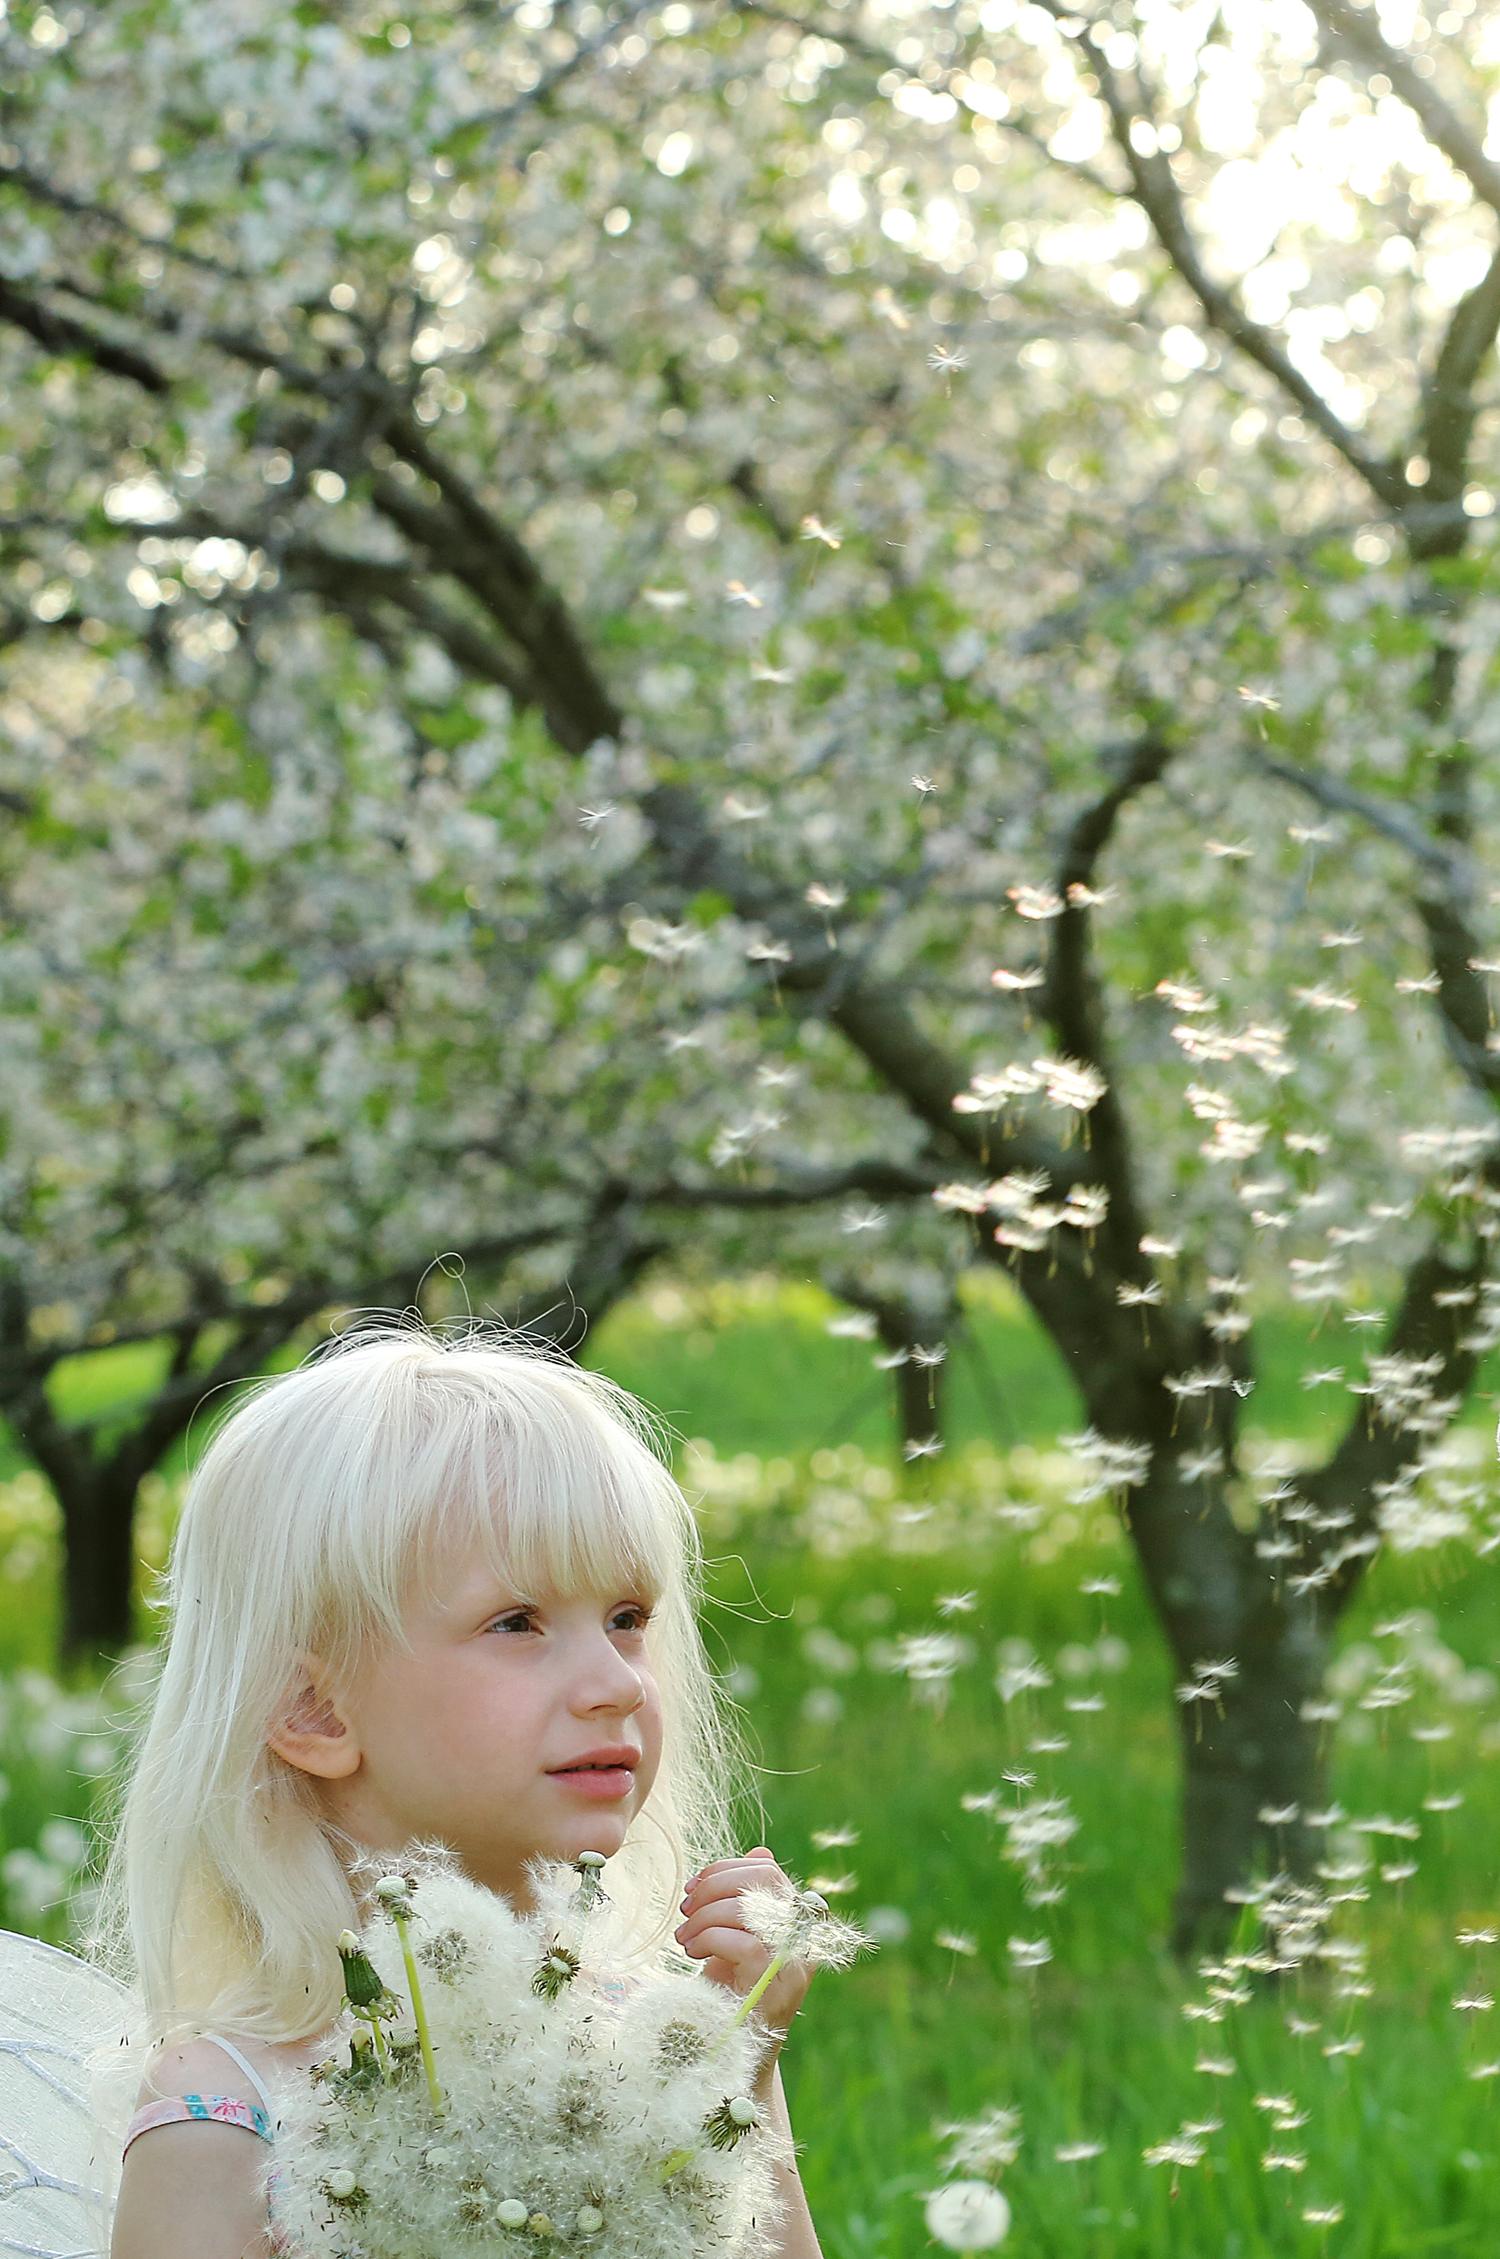 Arcadia, Michigan Cherry blossoms, Spring 2014.